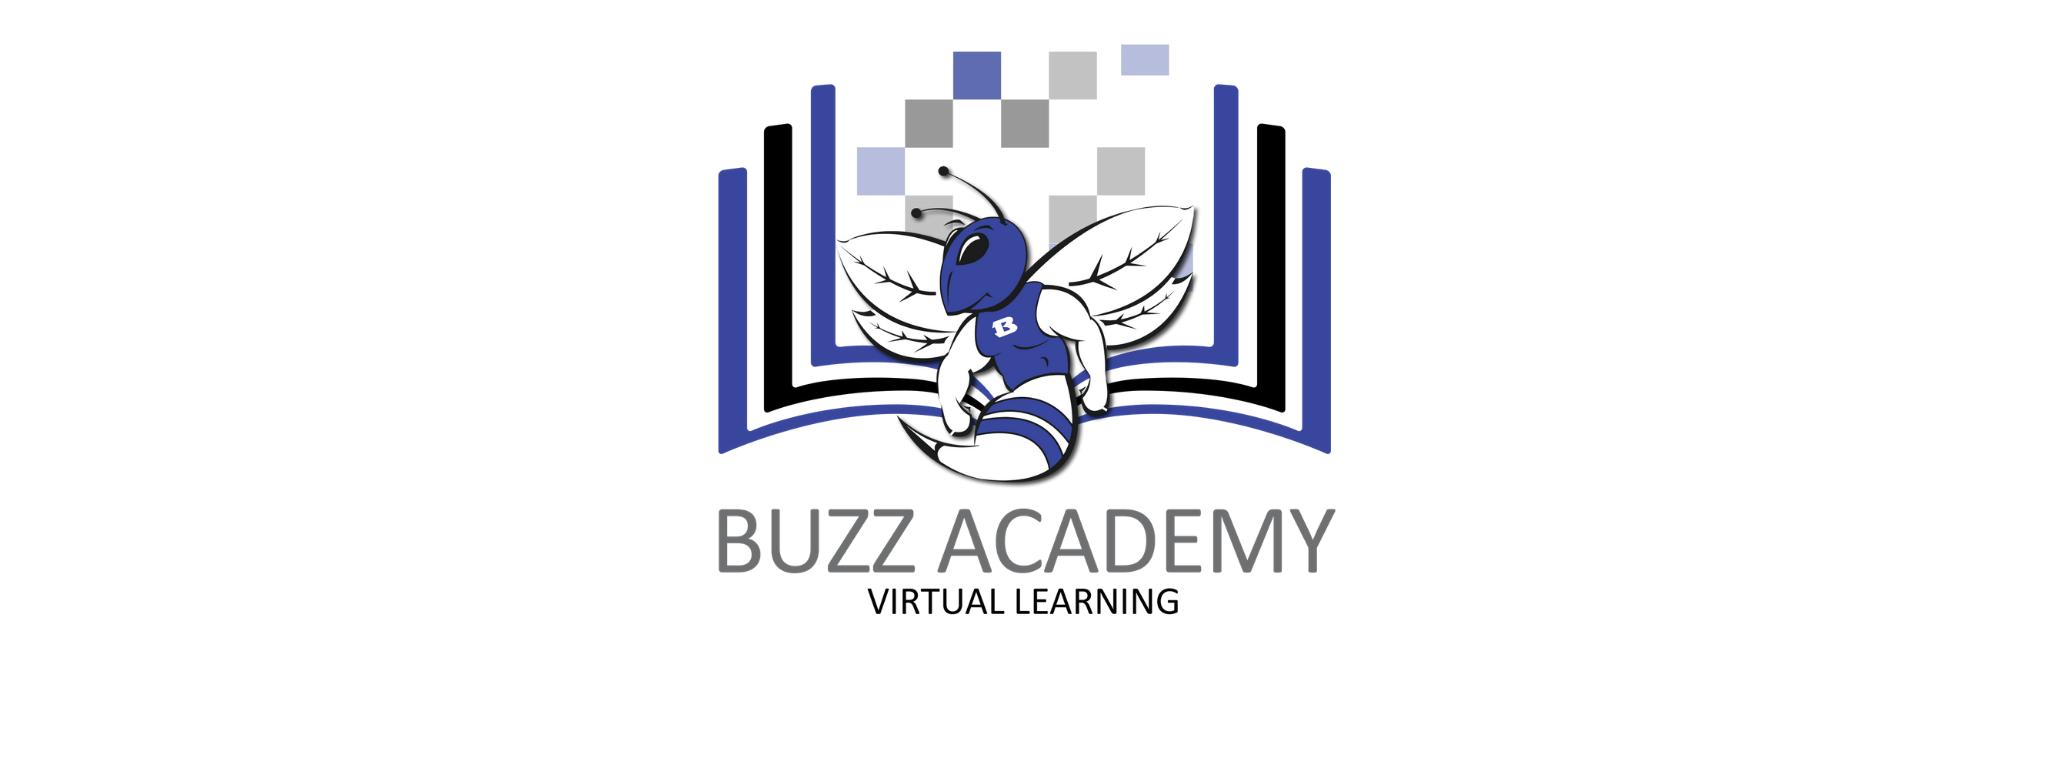 Buzz Academy